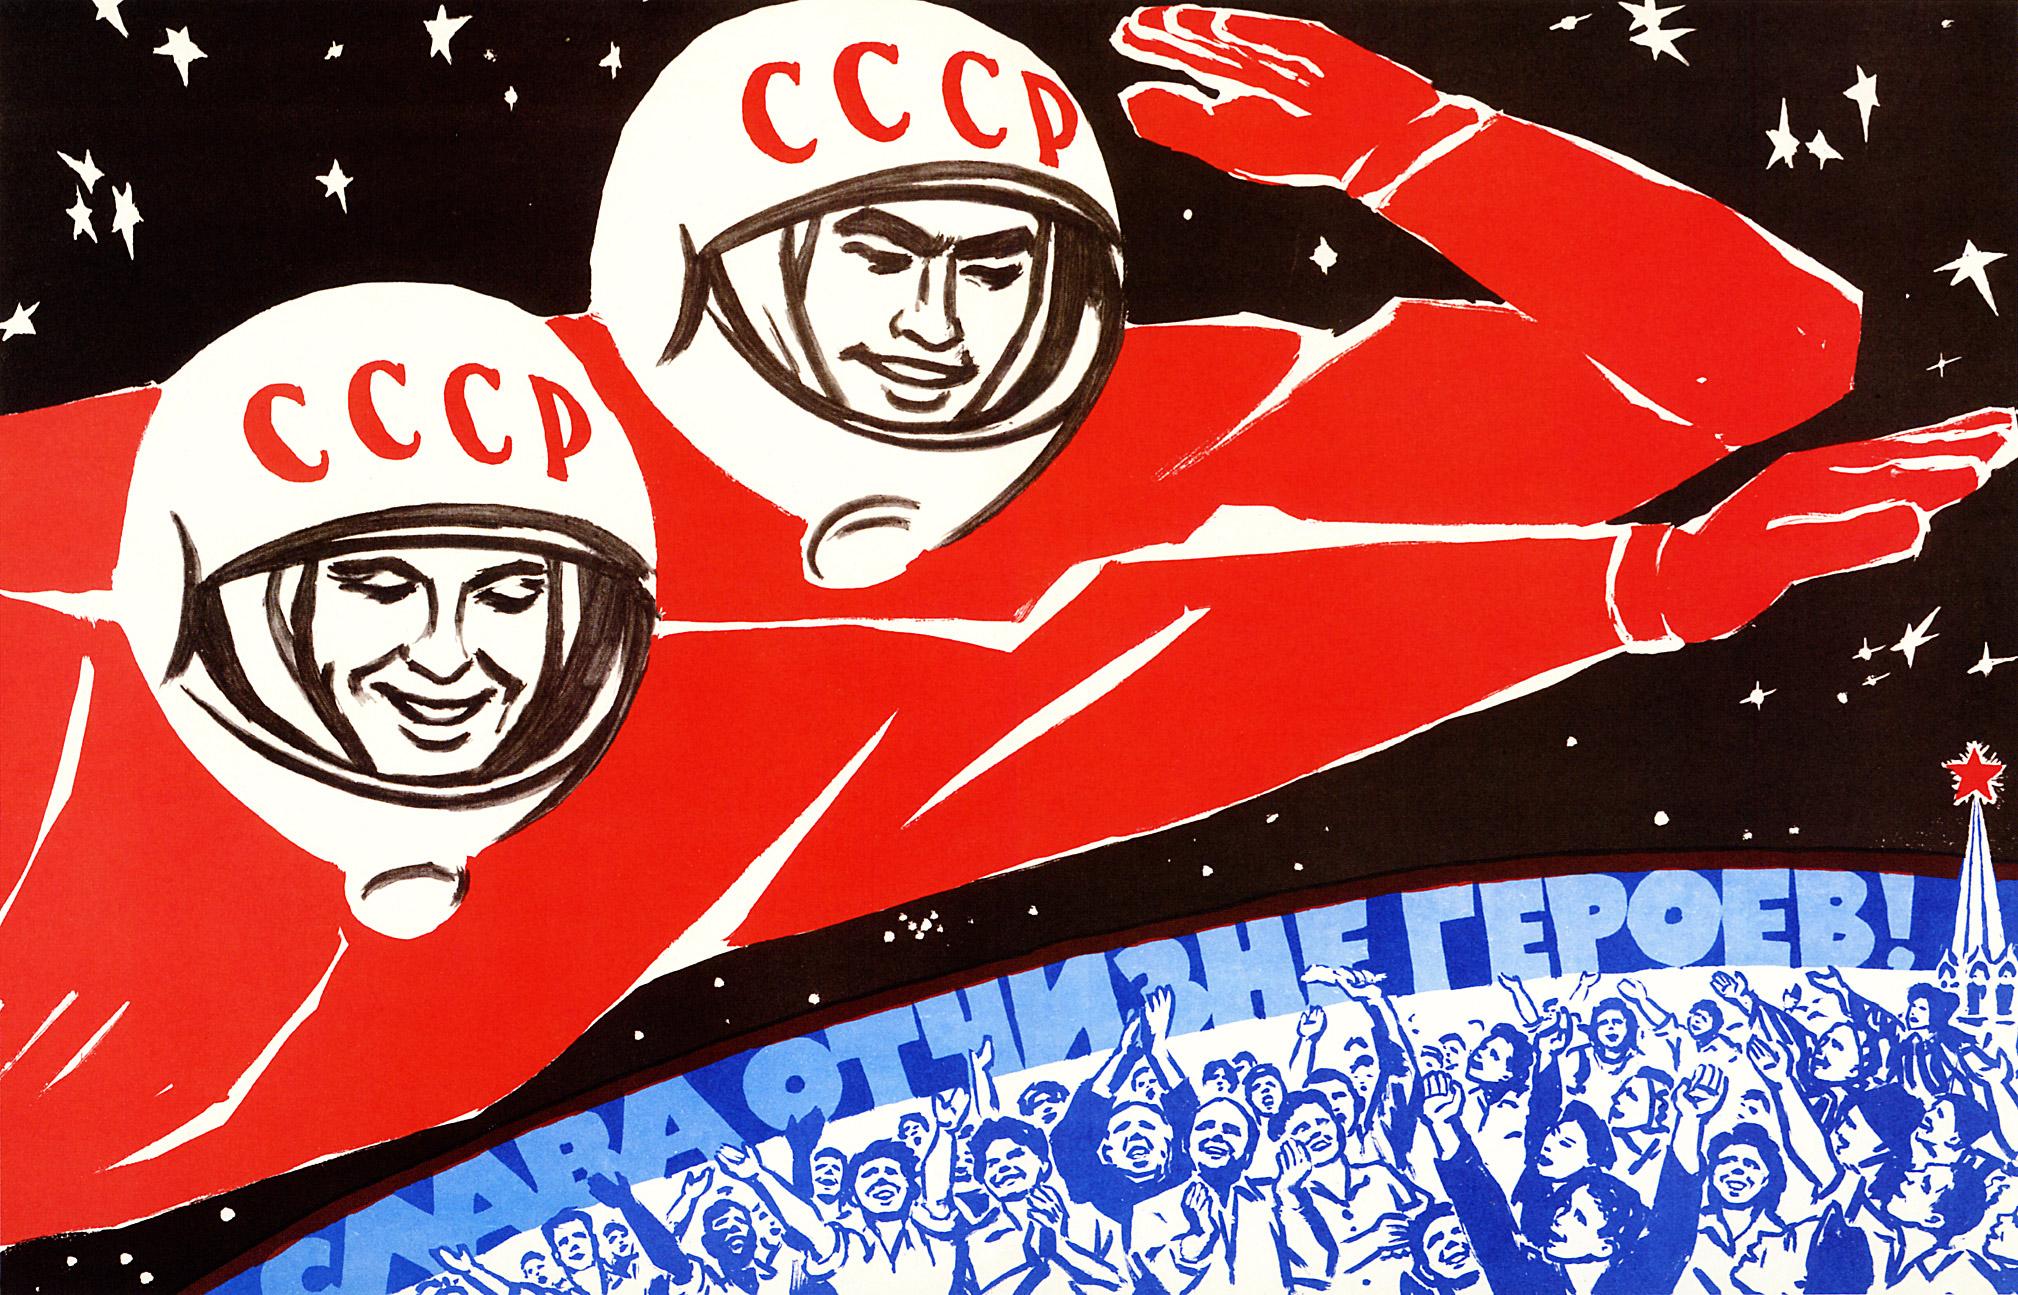 soviet-space-program-propaganda-poster-24